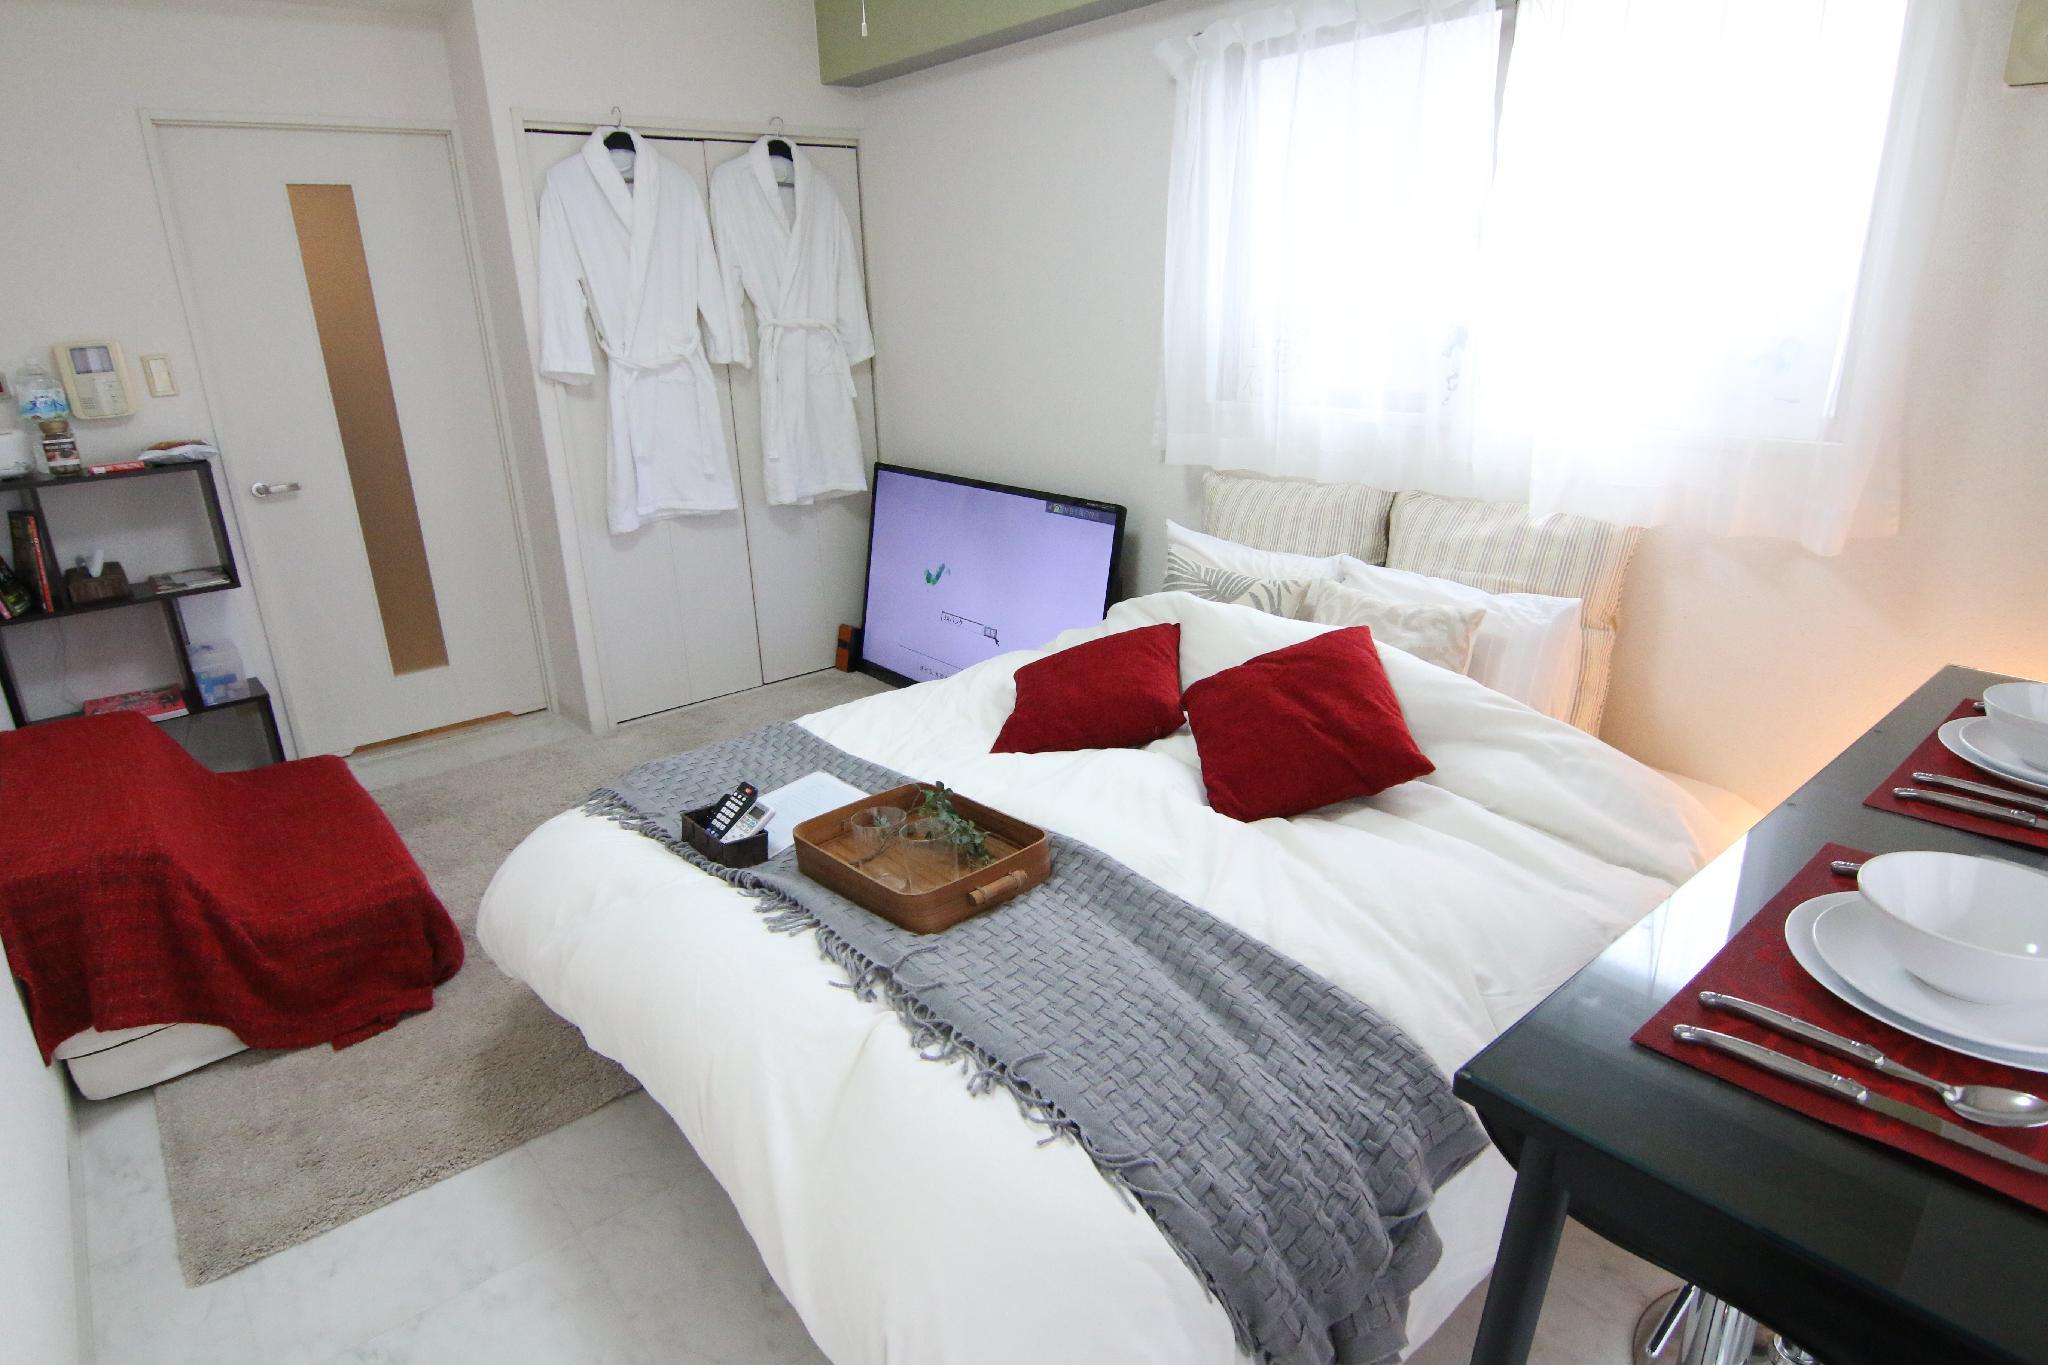 KUROMON HARVEST HOTEL801 LICENSED